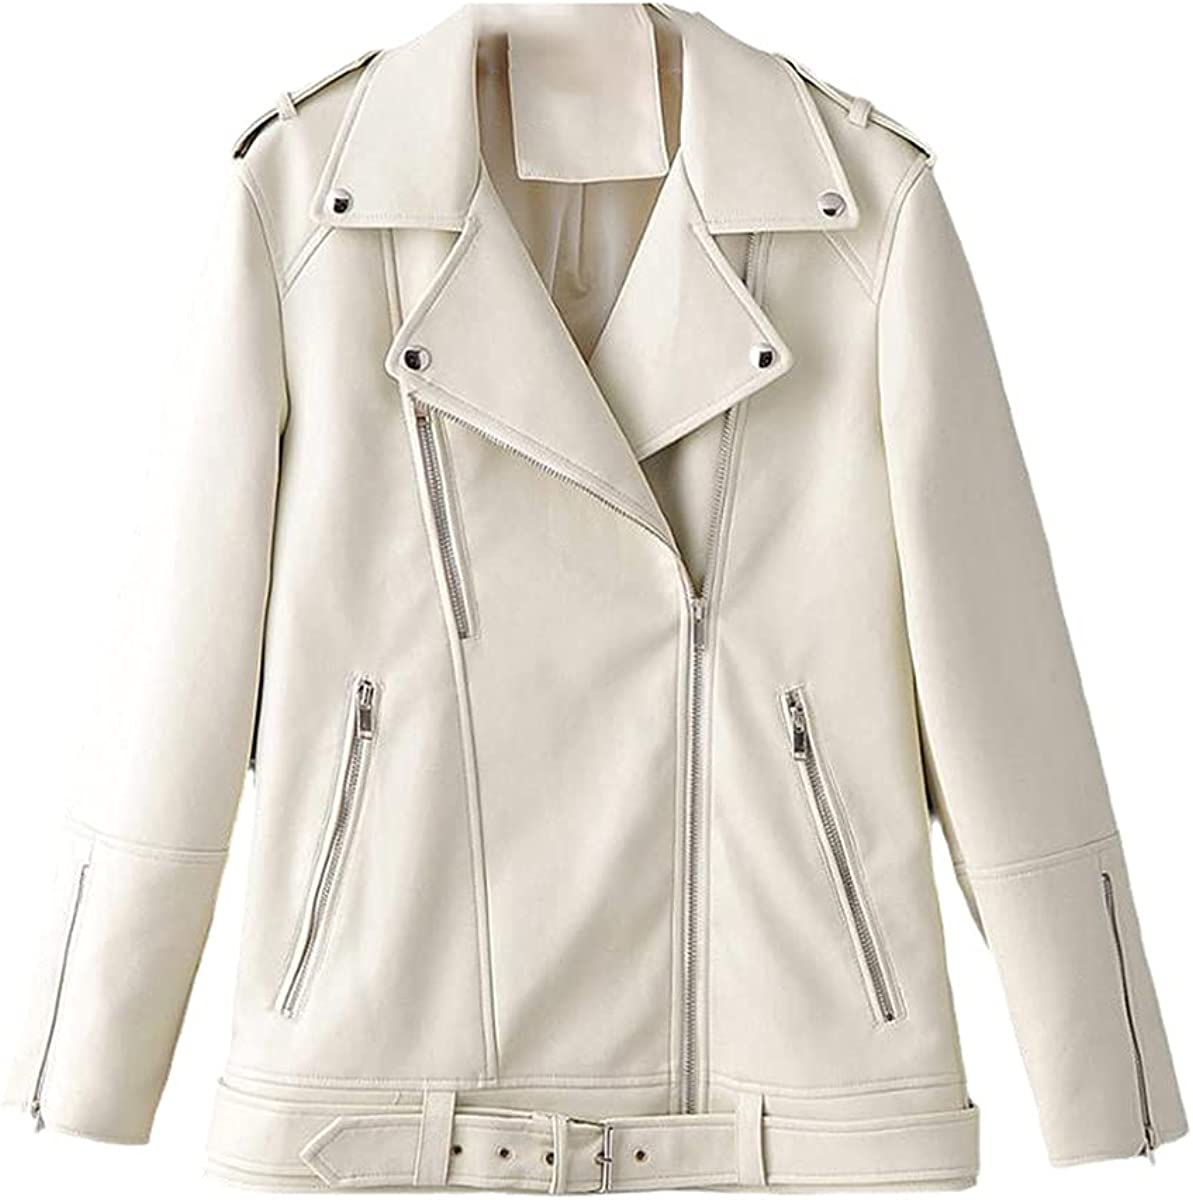 Autumn Women's Faux Leather Jacket Casual Loose Soft PU Motorcycle Punk Leather Coat Zipper Rivet Jacket